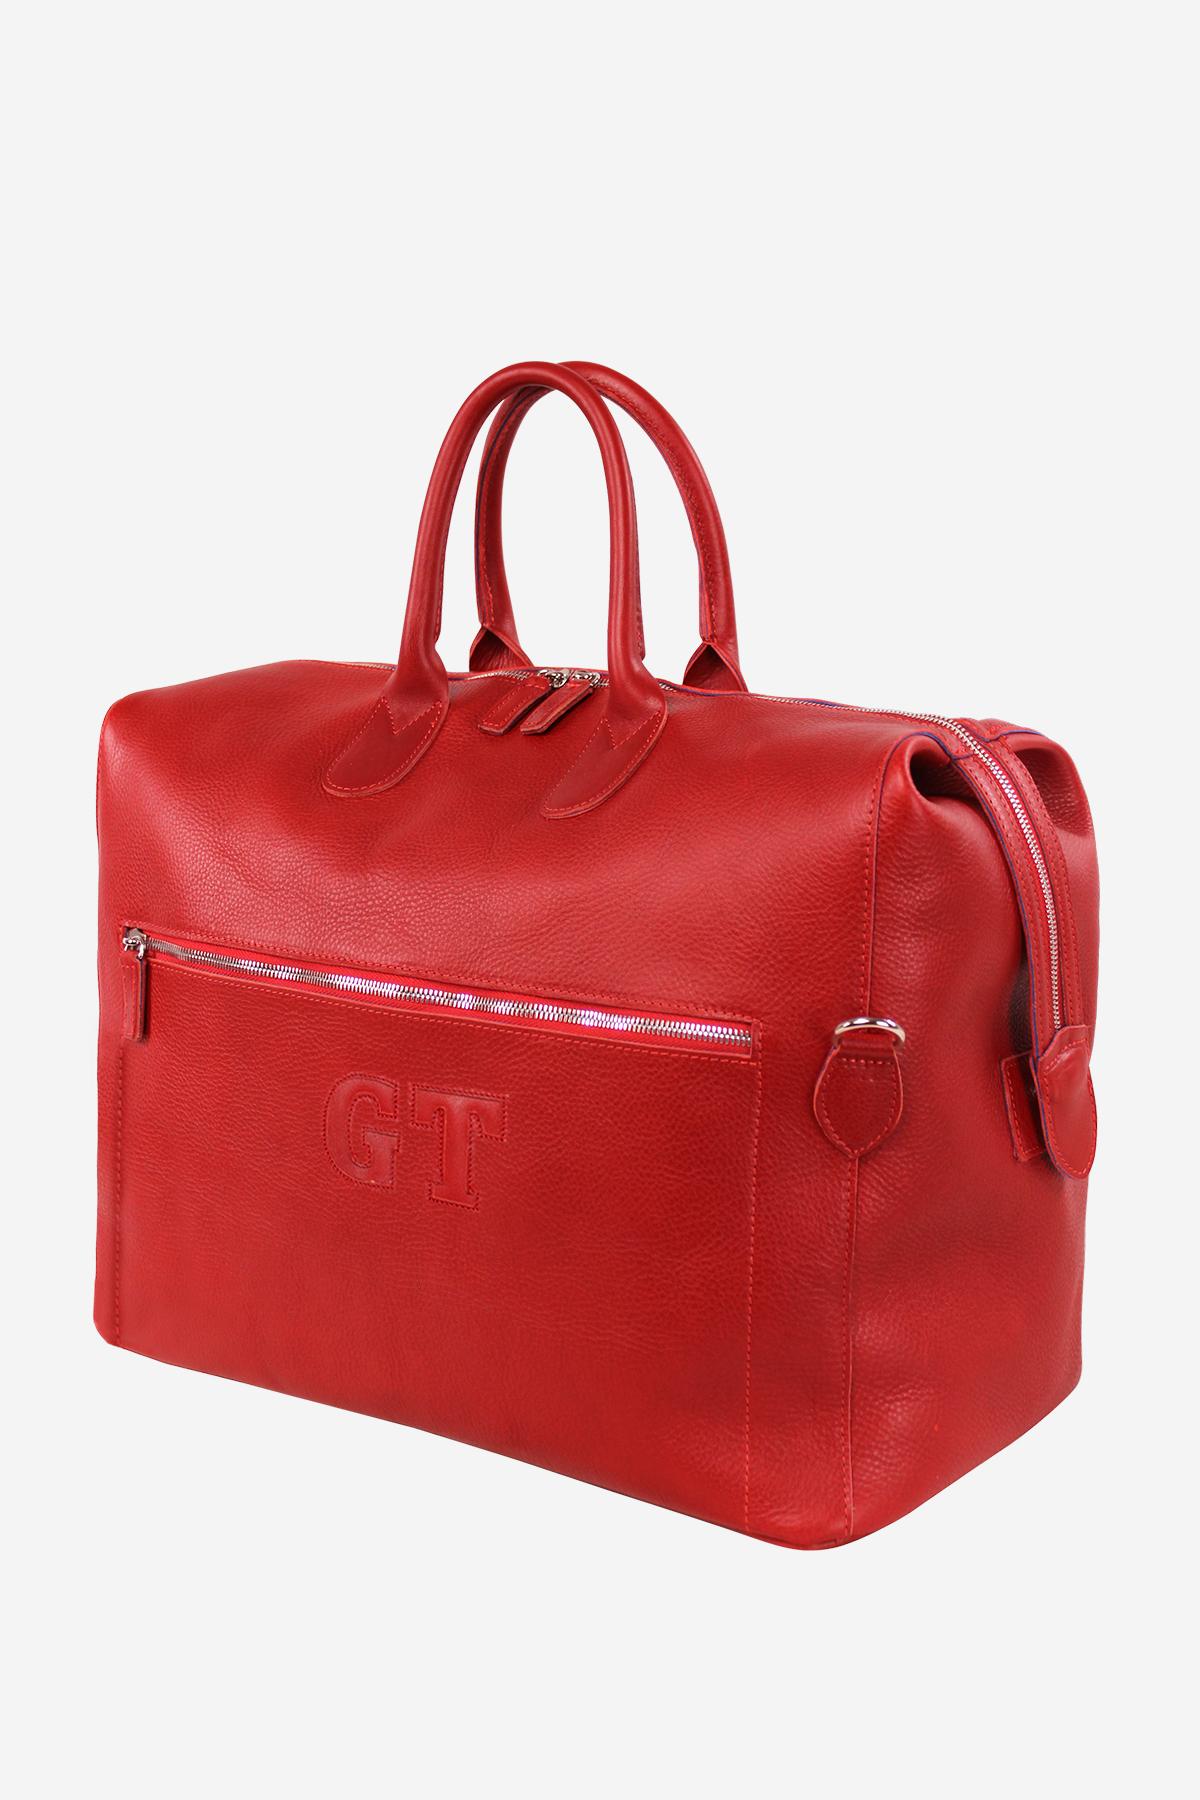 Shield Duffle Bag handmade in italy vegetable tanned leather travel business terrida venezia italian bags